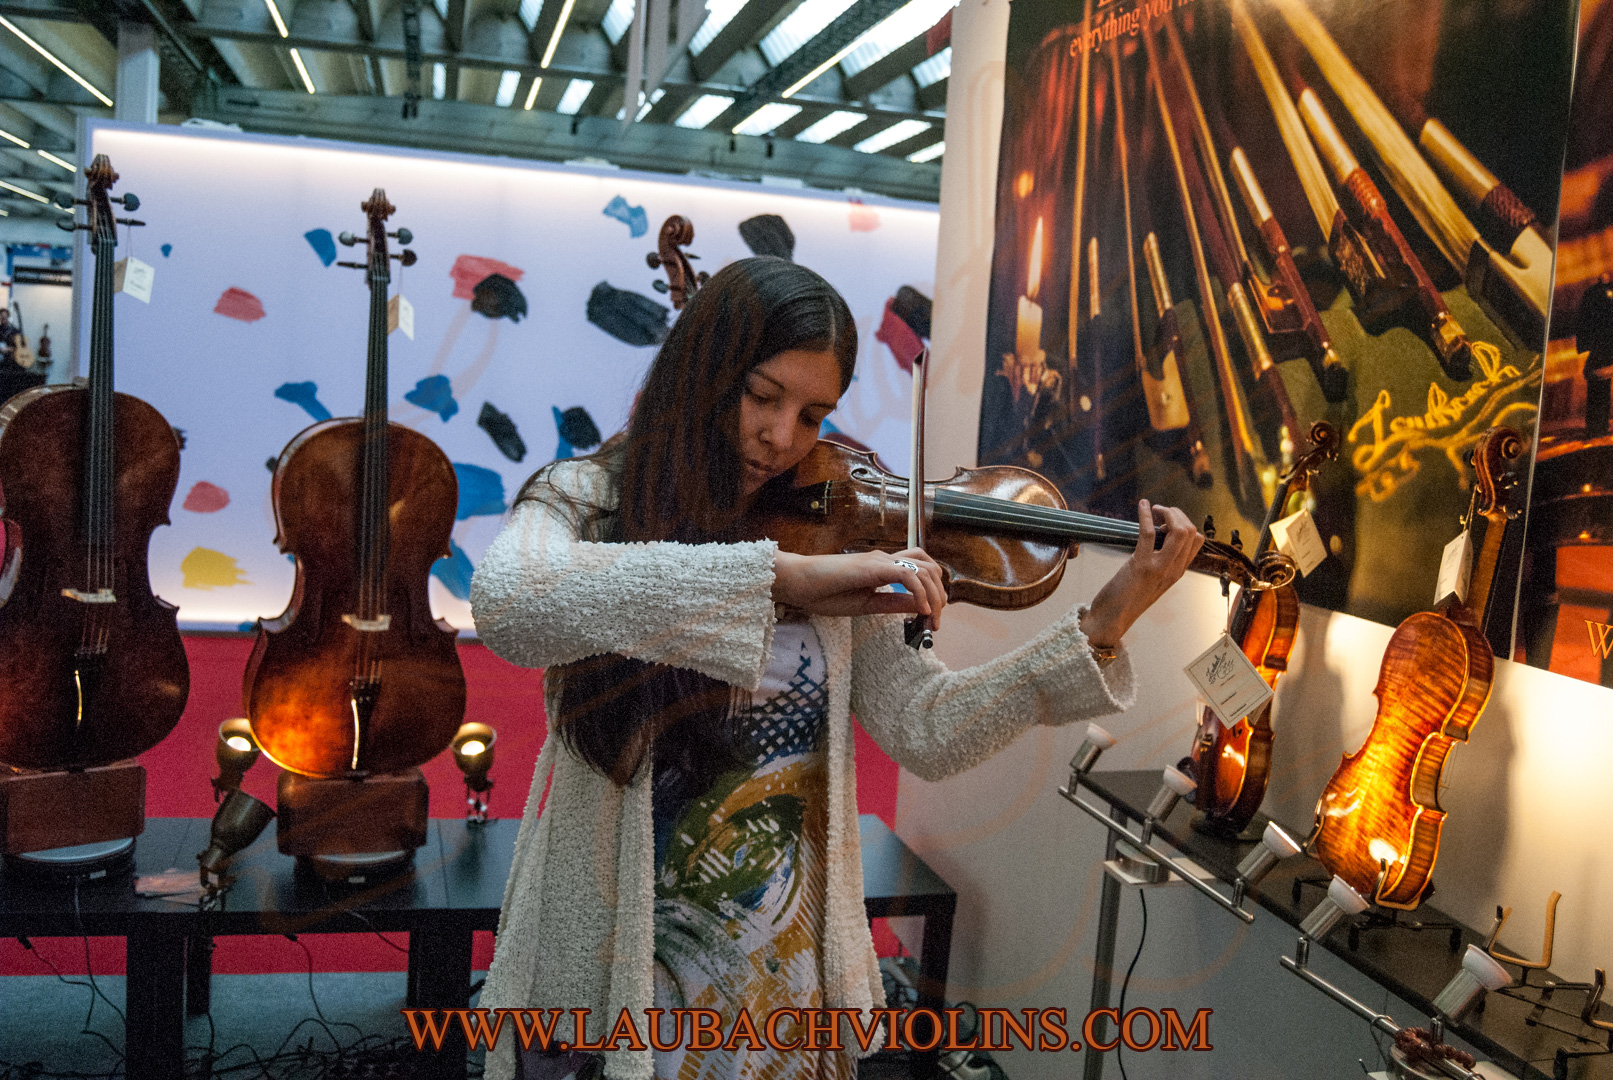 laubach_musikmesse_frankfurt_2017_11.jpg